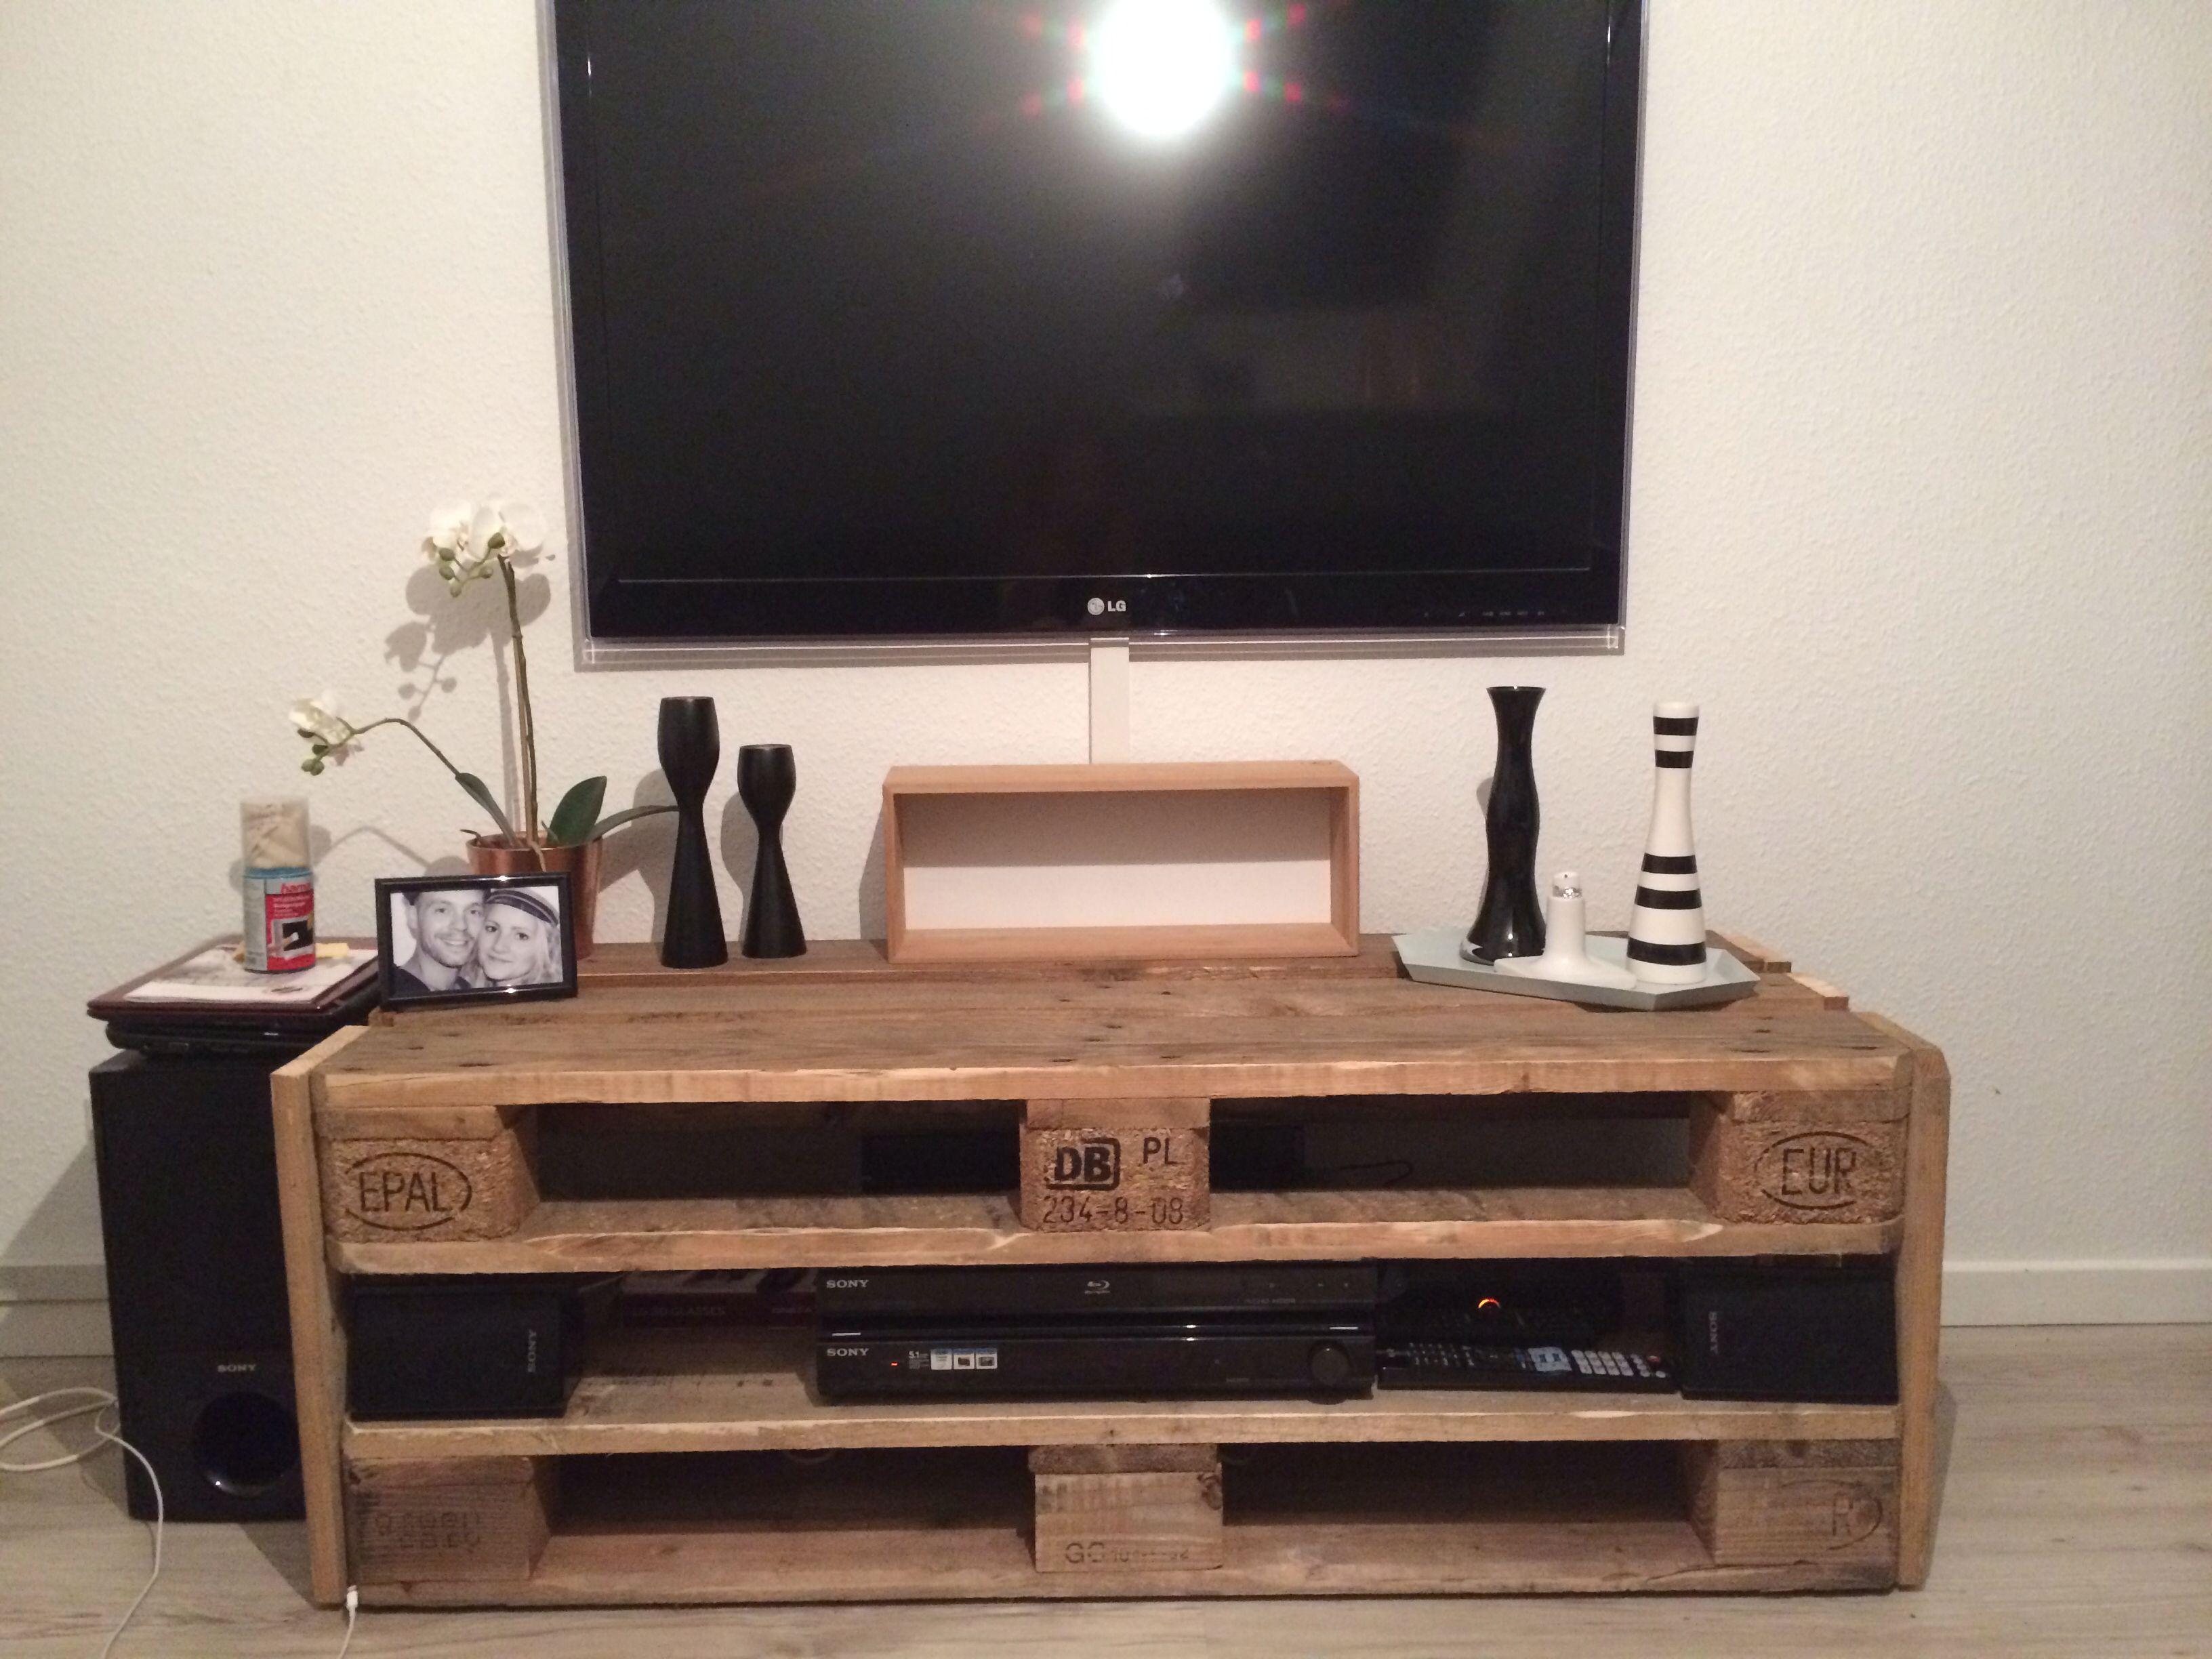 tv bord TV bord af paller | tv bord in 2018 | Pinterest | TVs, Living Room  tv bord